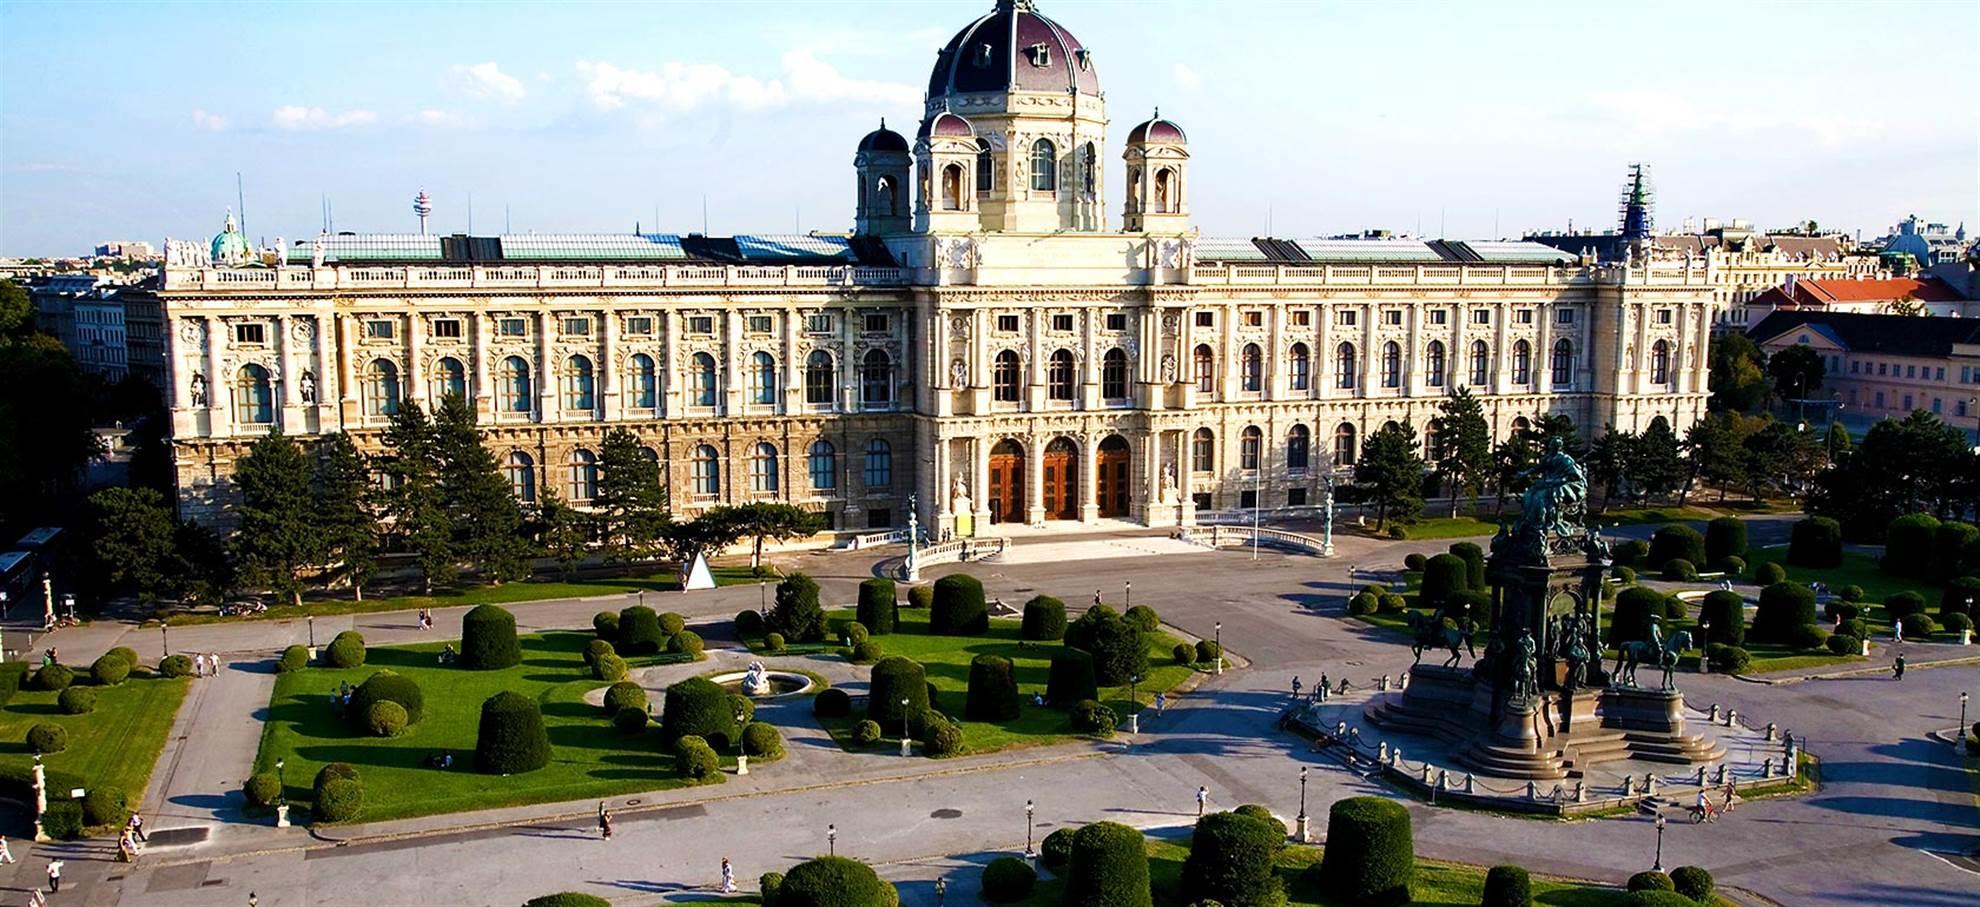 Kunsthistorisch Museum